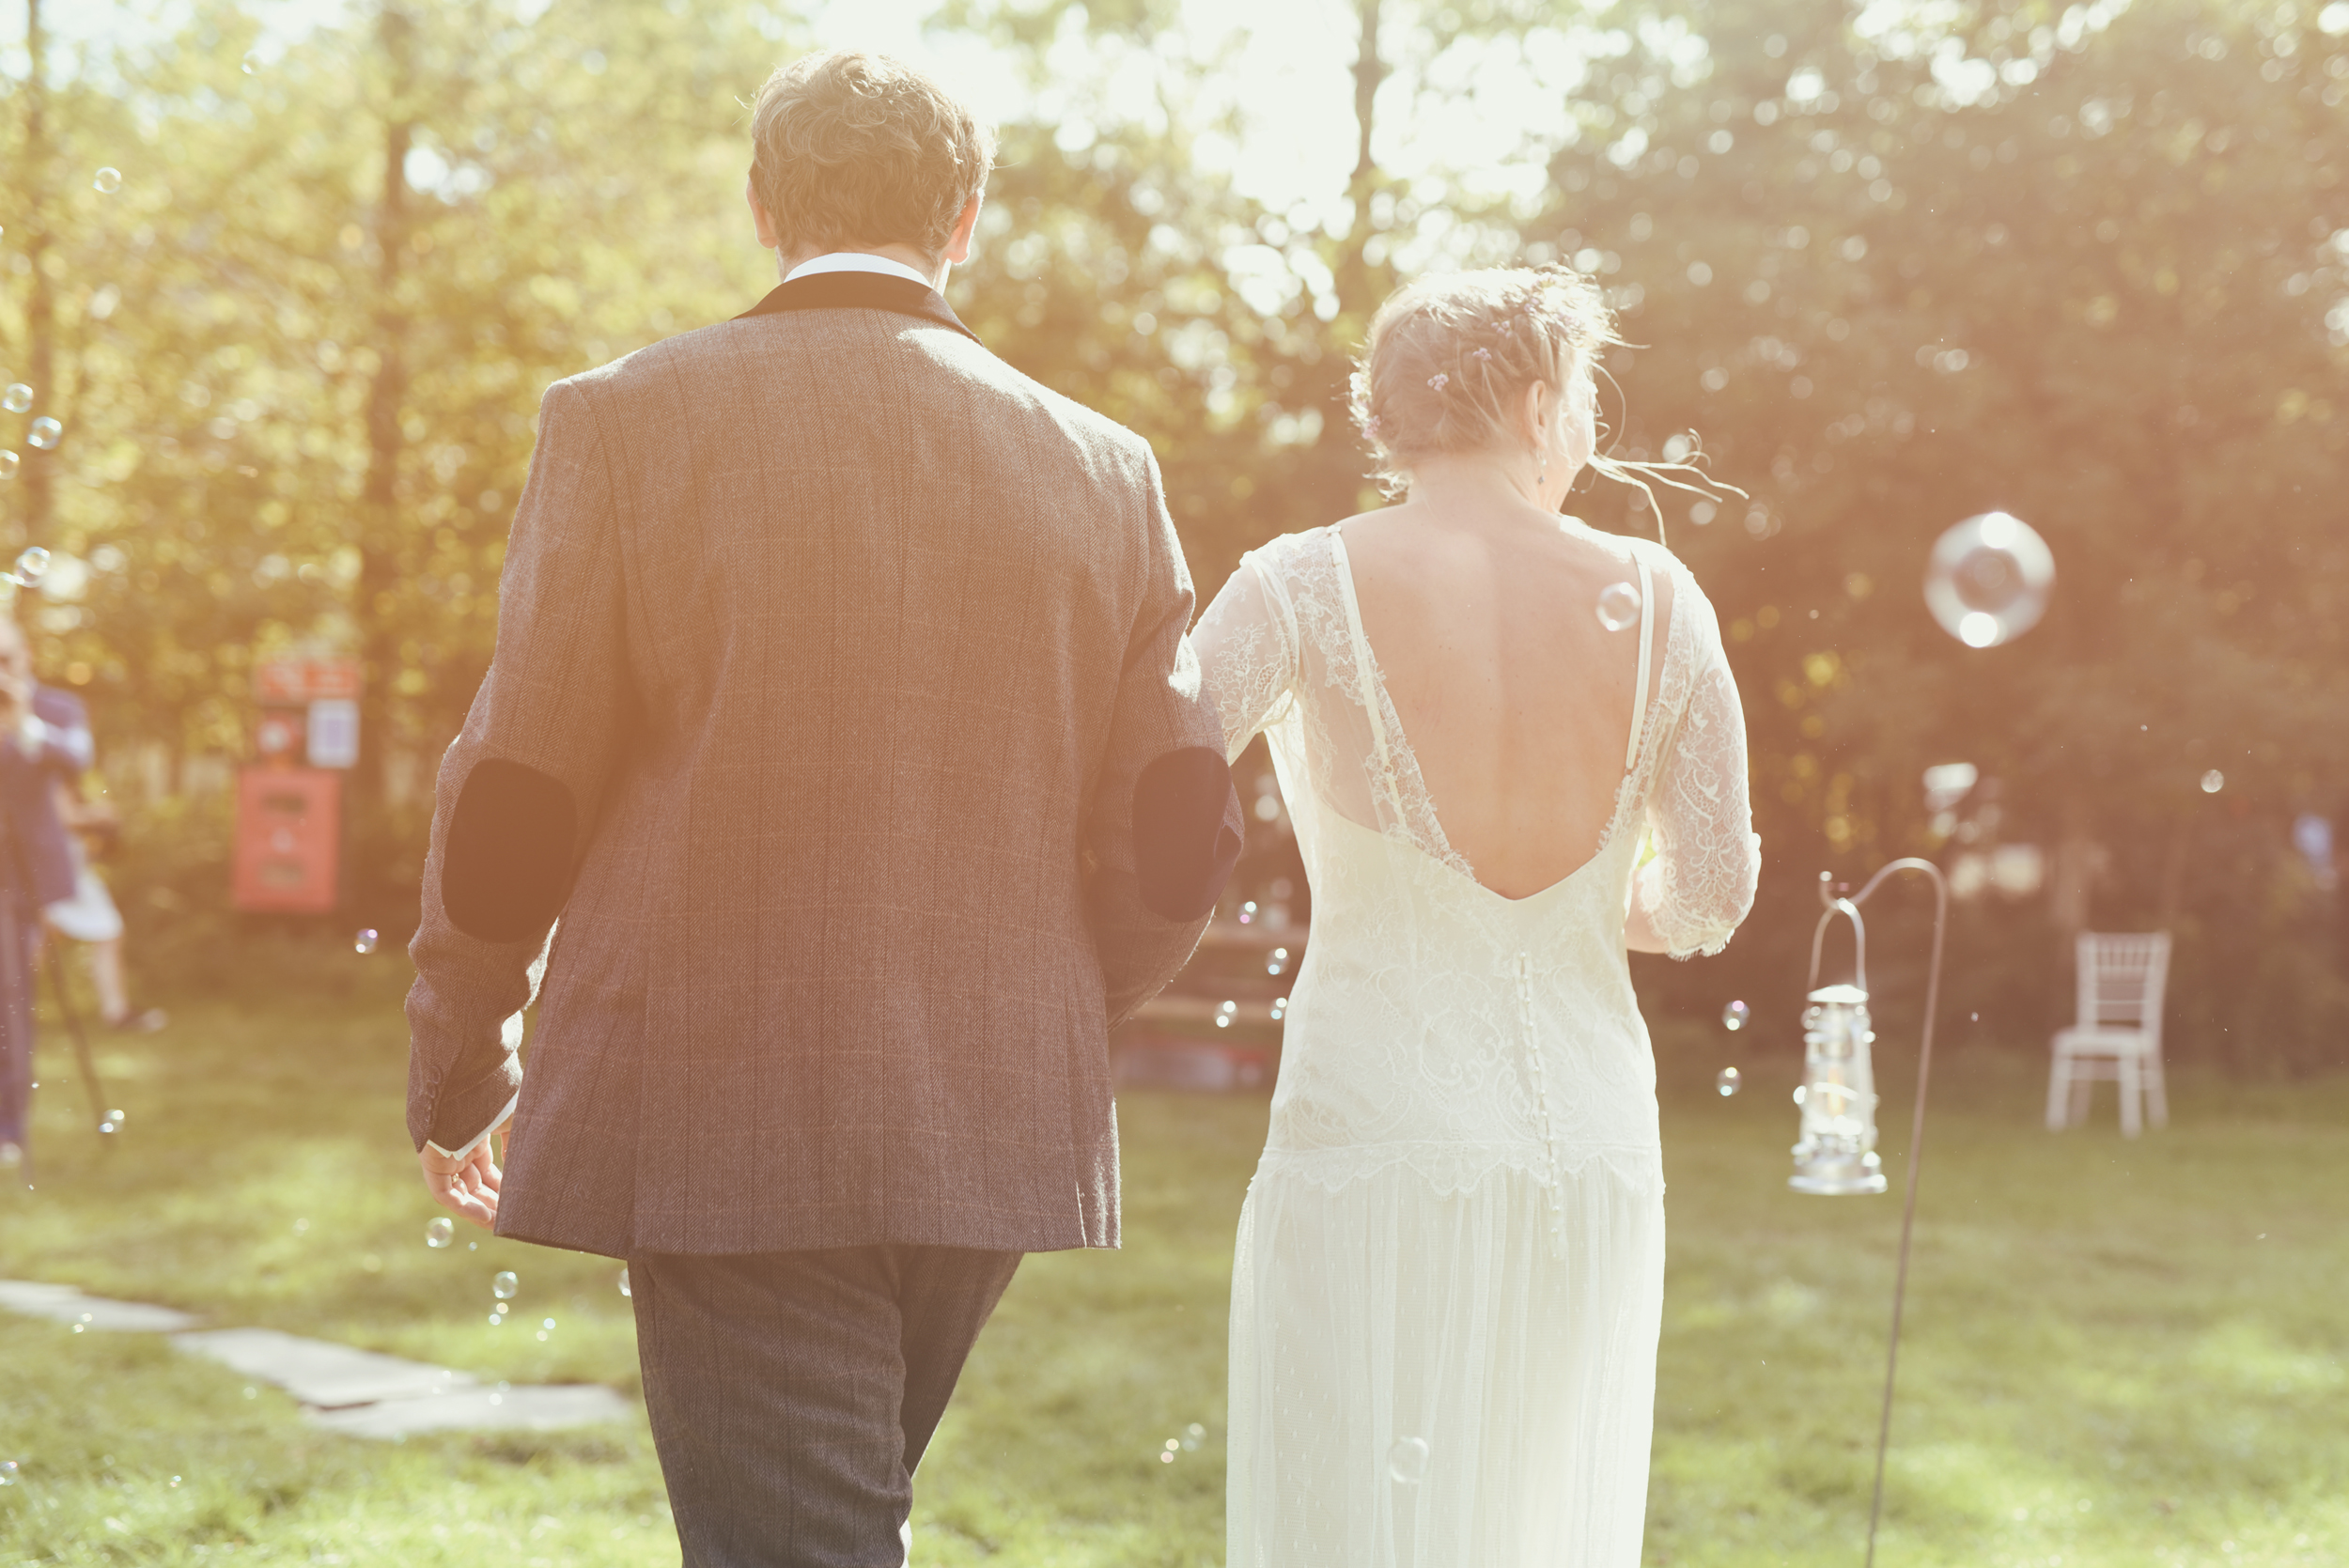 Miriam-Bespoke-Lace-Wedding-Dress-Kate-Beaumont-Sheffield-6.jpg